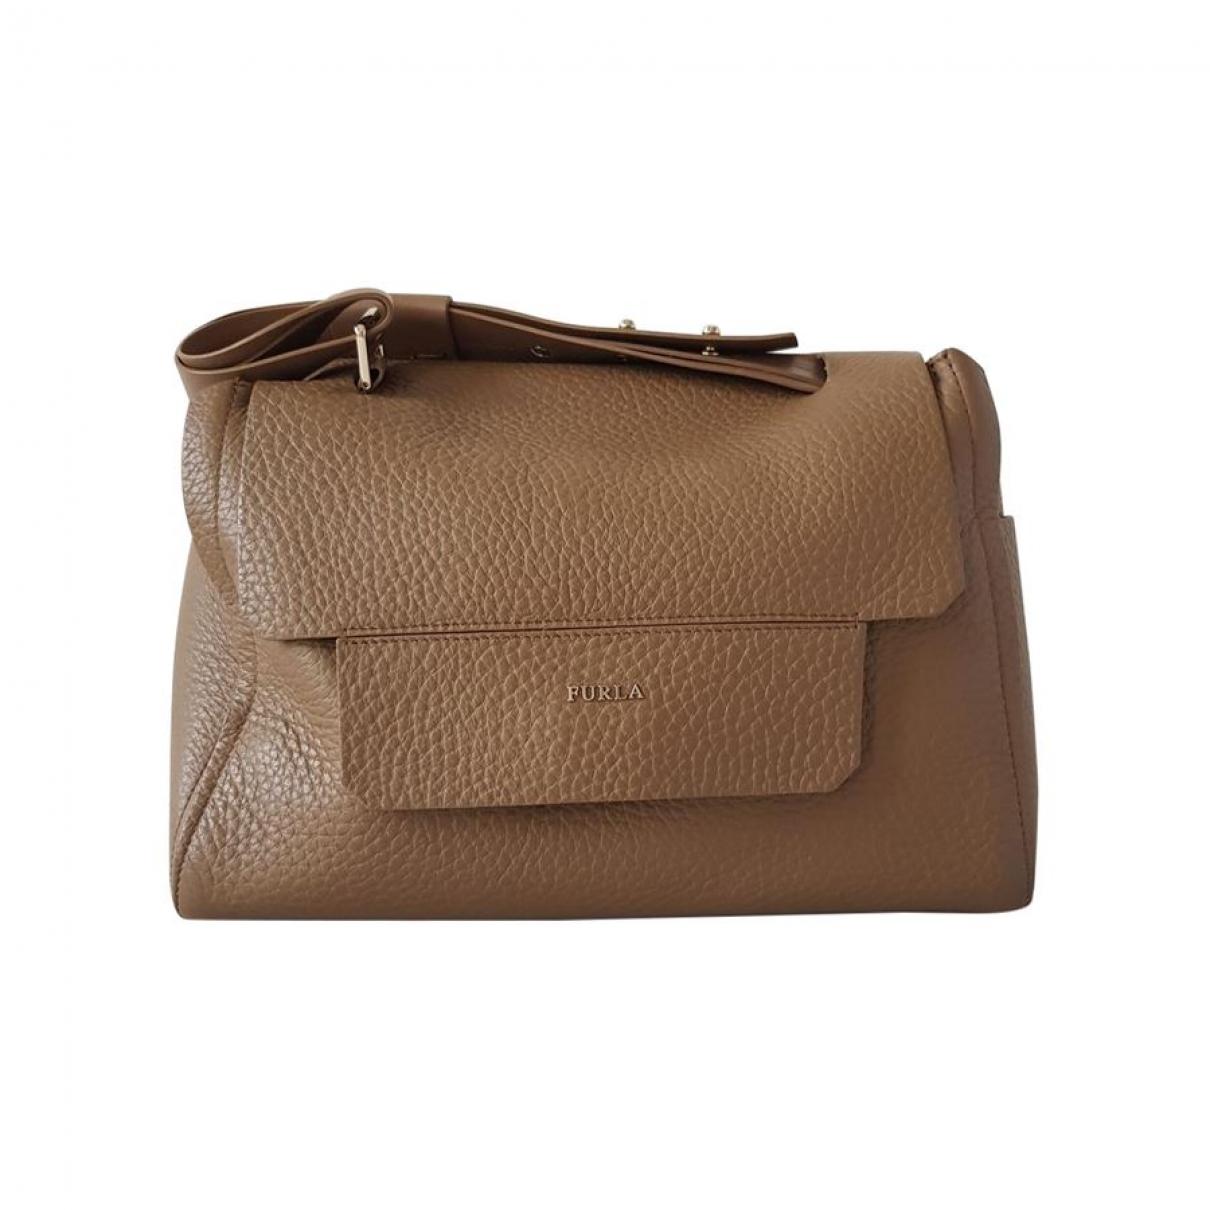 Furla \N Leather handbag for Women \N